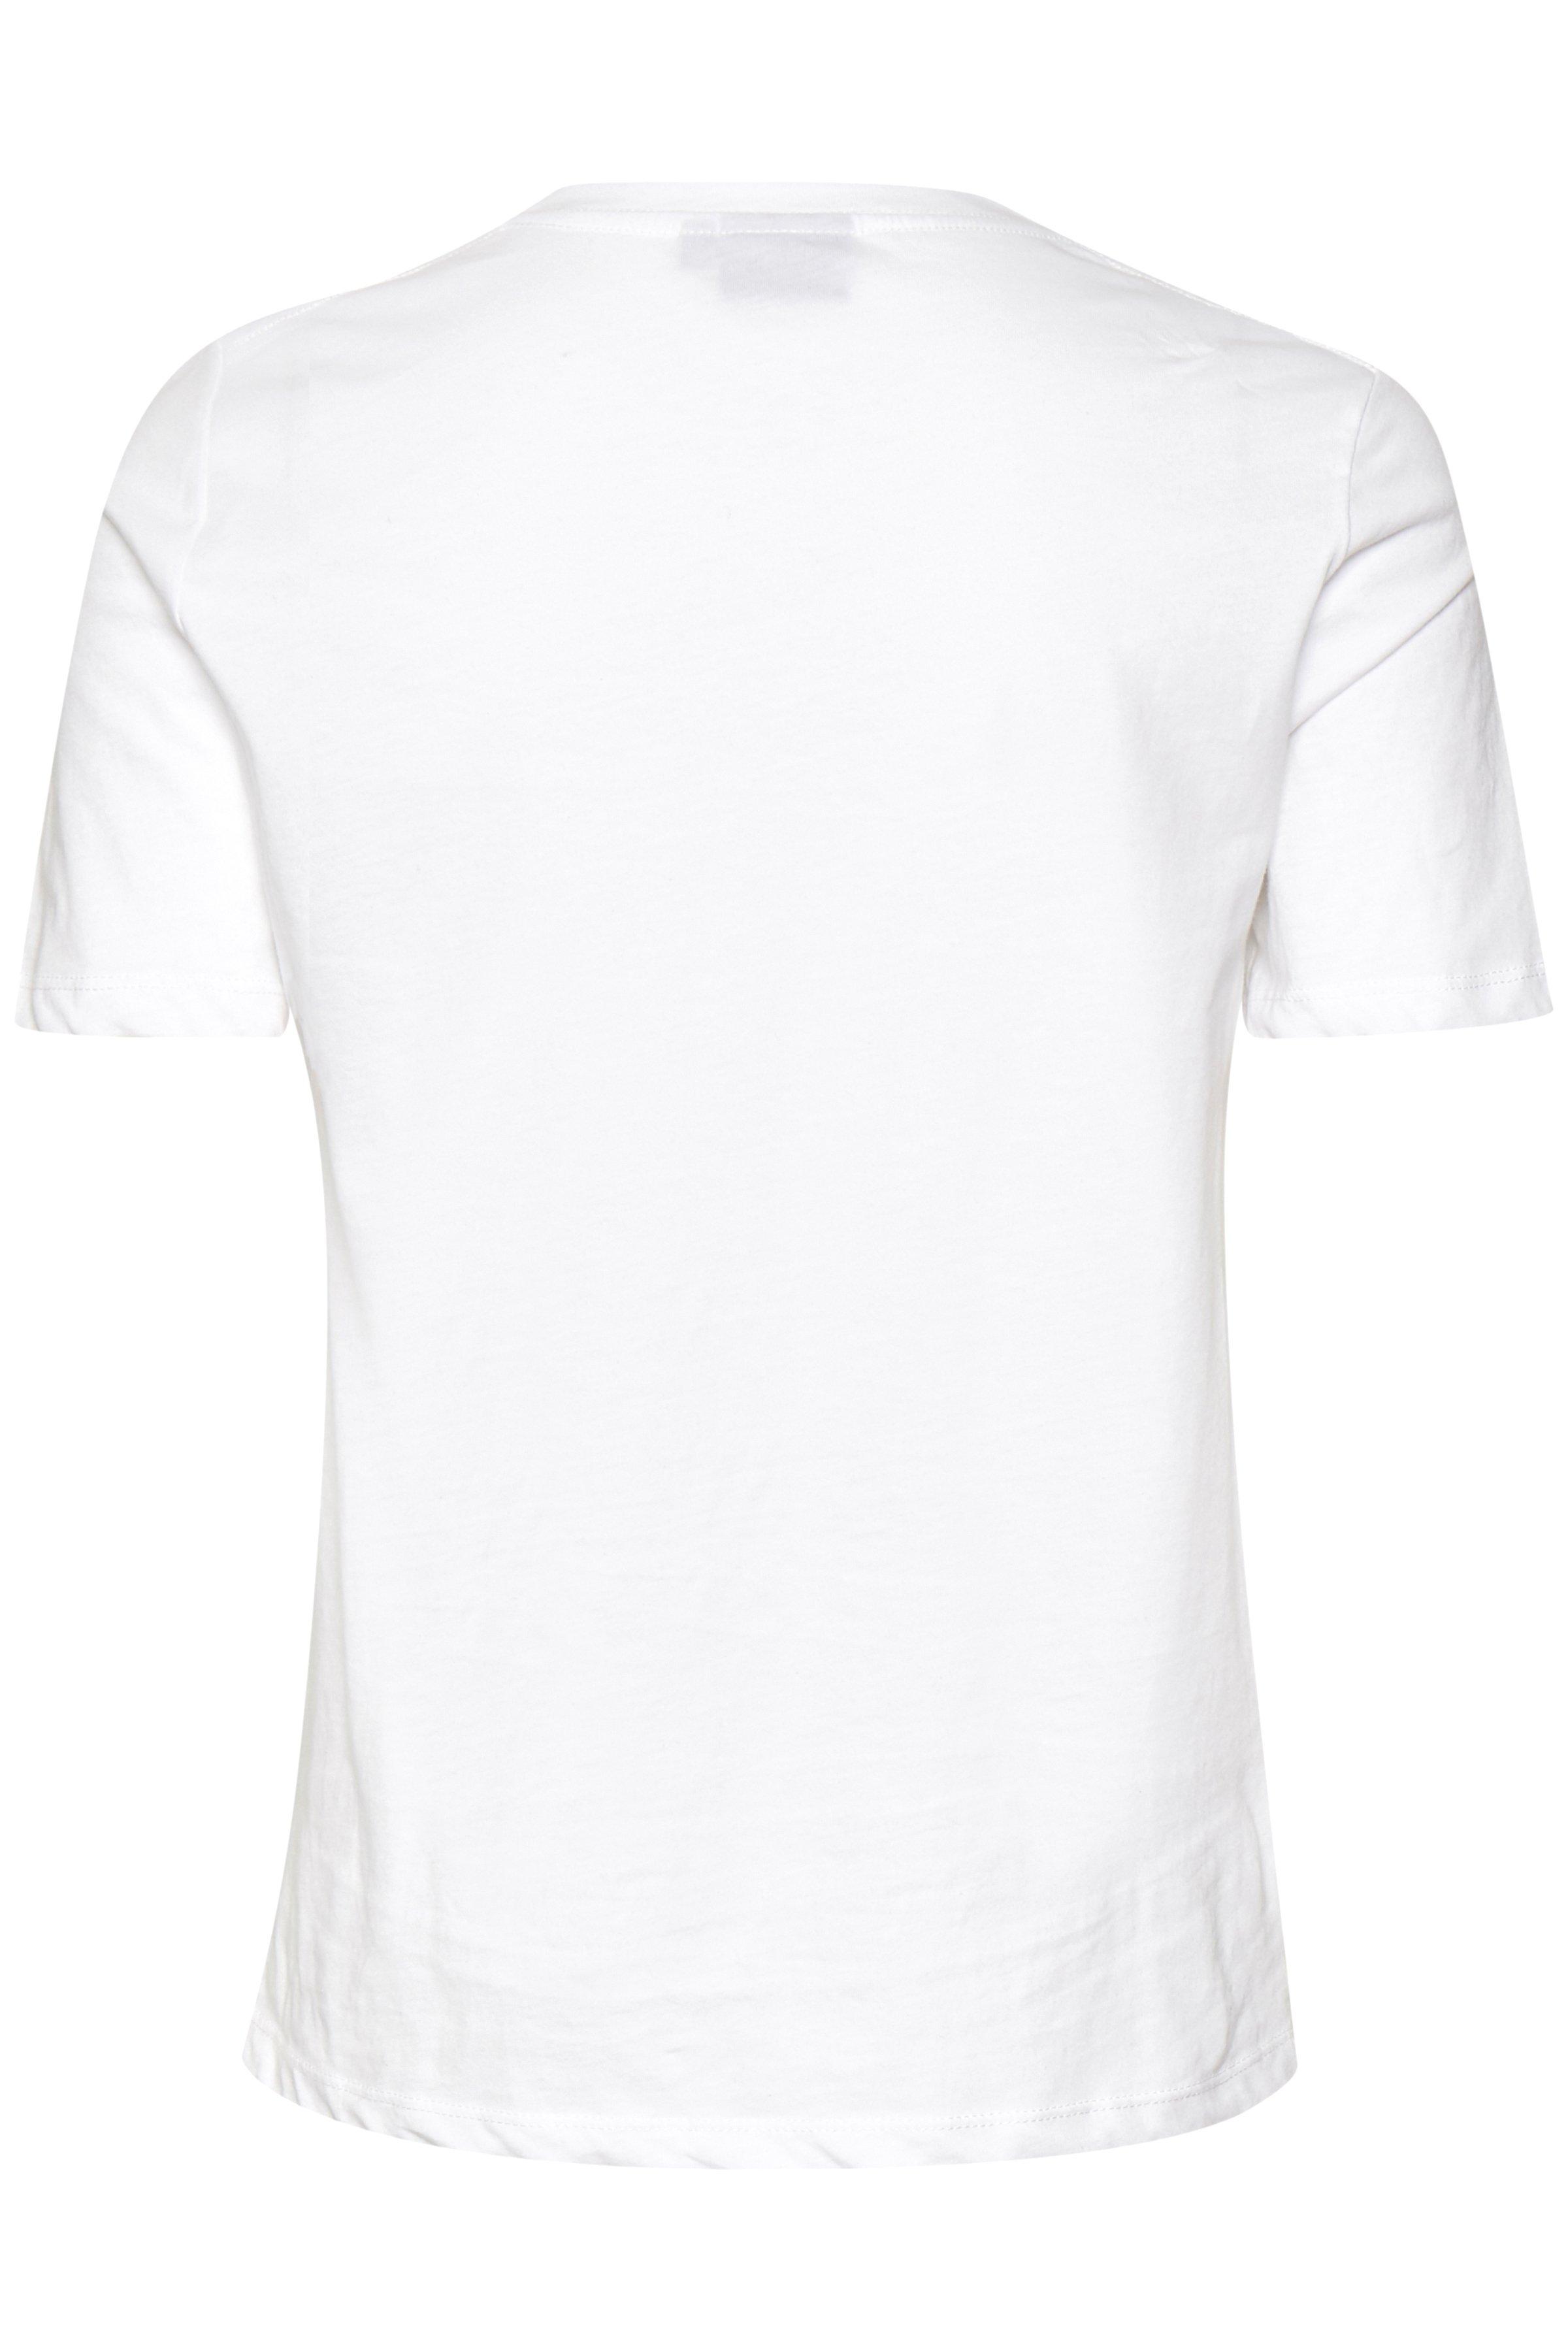 Vit/röd T-shirt från b.young – Köp Vit/röd T-shirt från storlek XS-XXL här